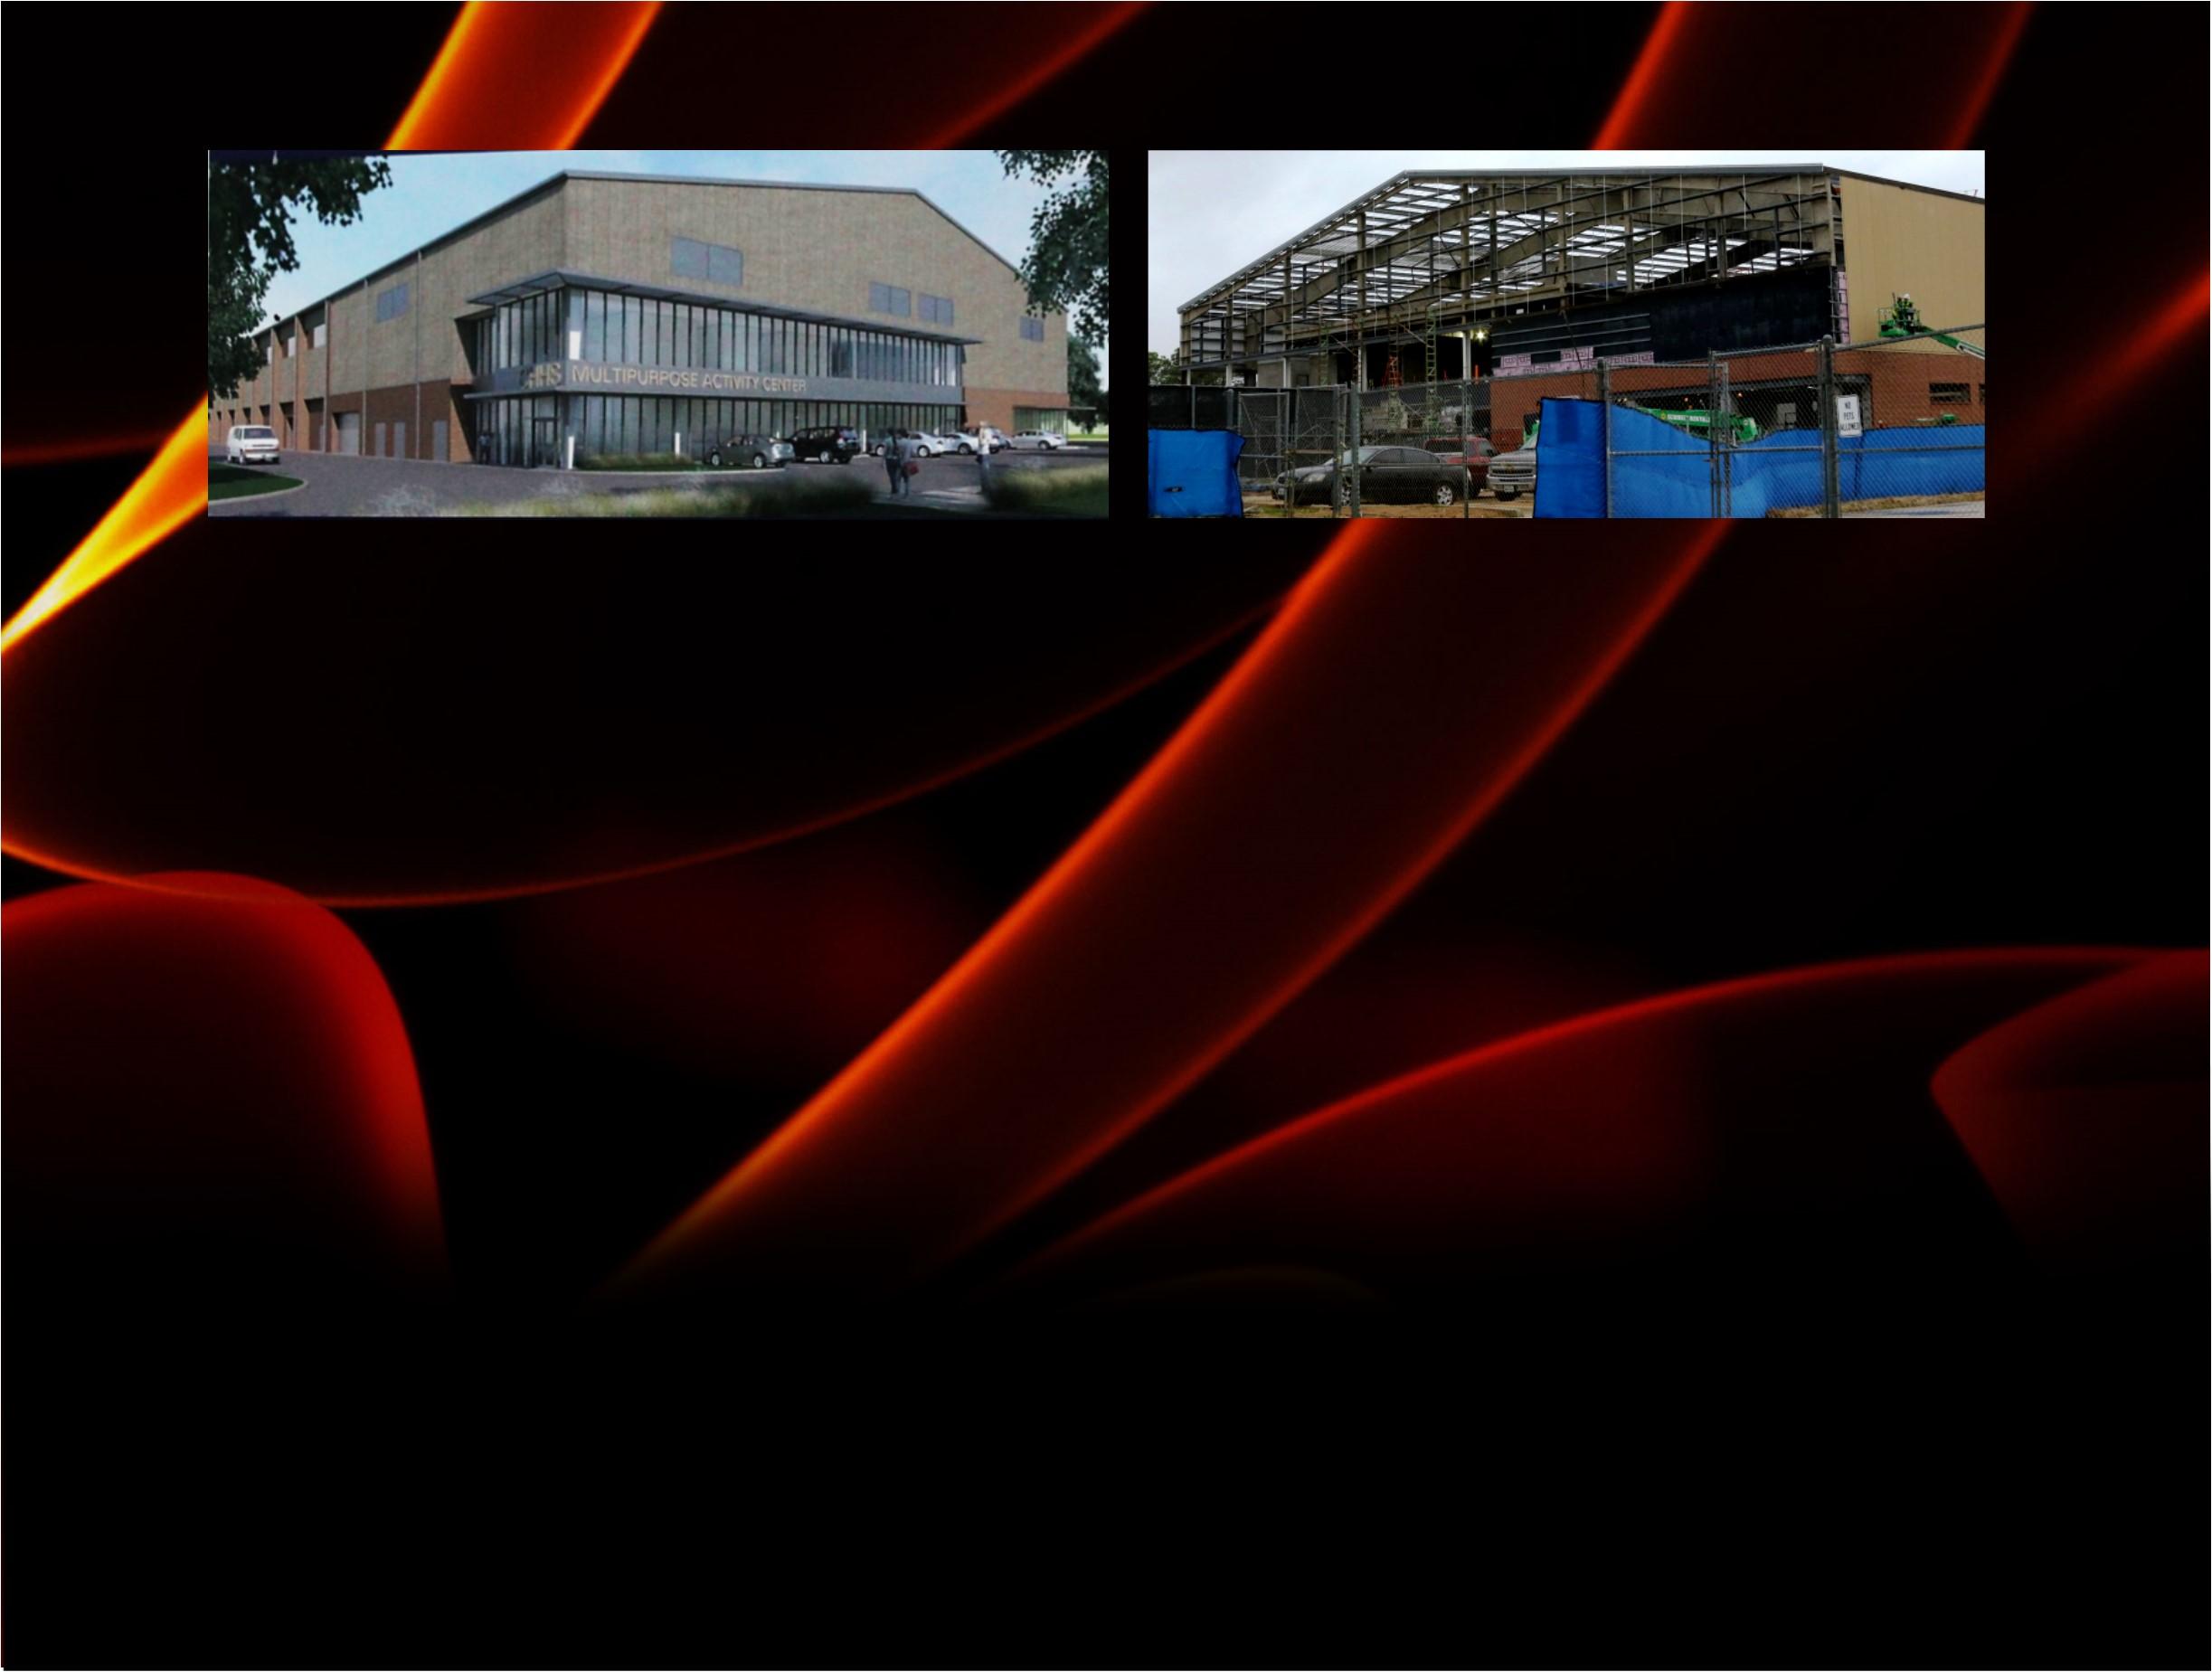 February 20, 2018 - - CHHS Multipurpose Activity Center Construction Update